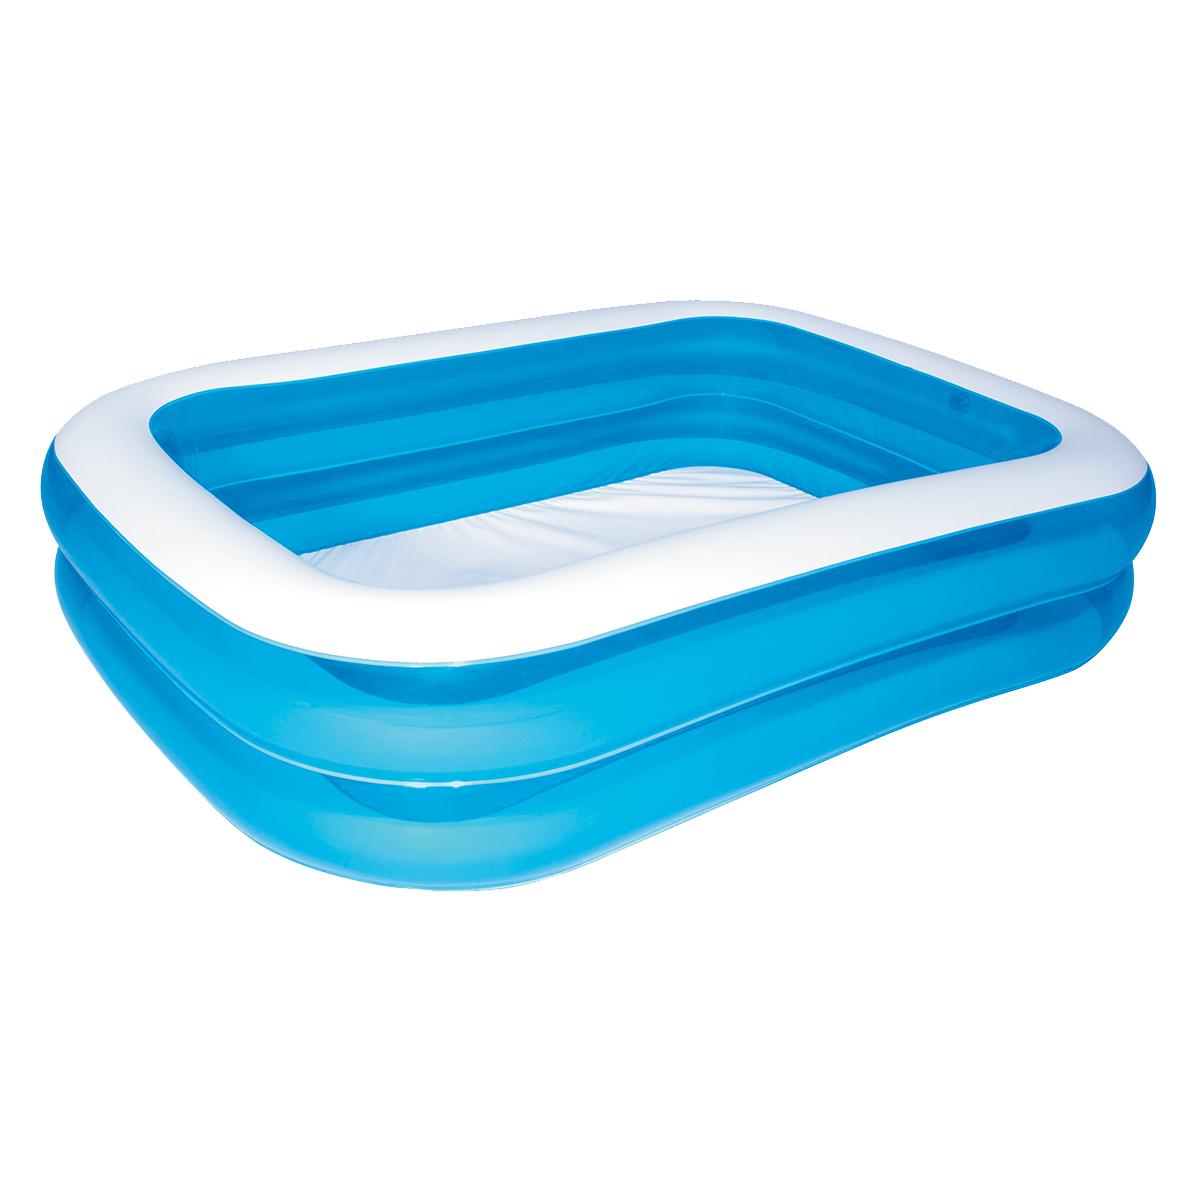 bestway-201-x-150-x-51cm-blue-rectangular-family-pool-code-54005